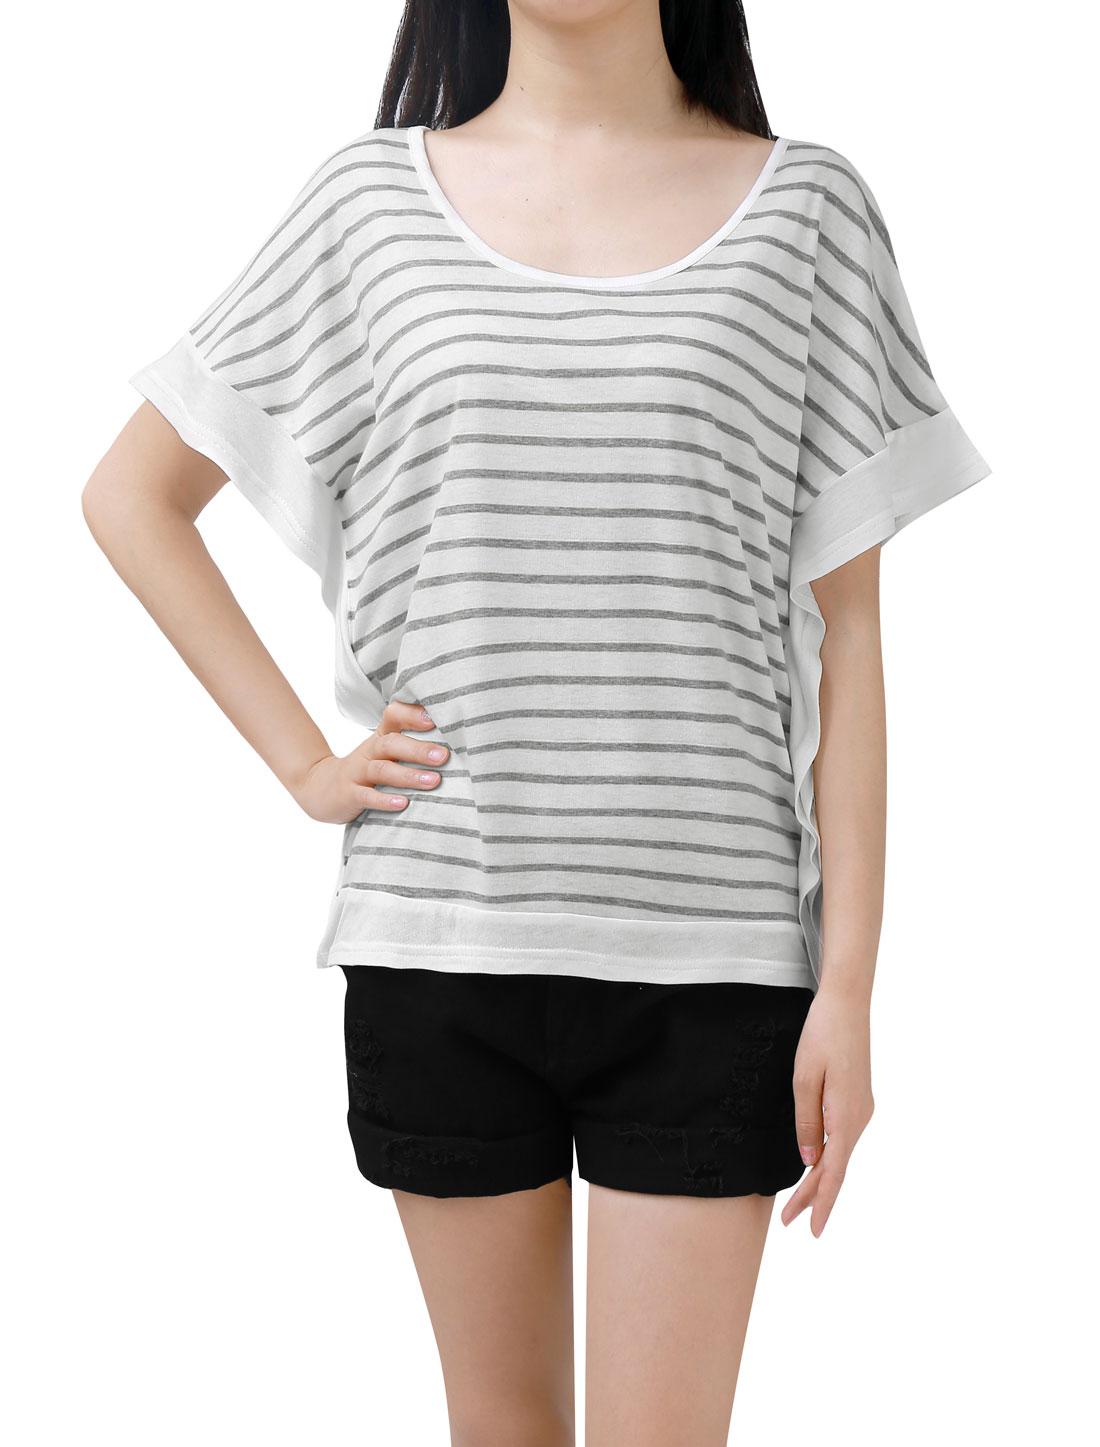 Women Panel Trim Horizontal Stripe T-shirt White Gray S